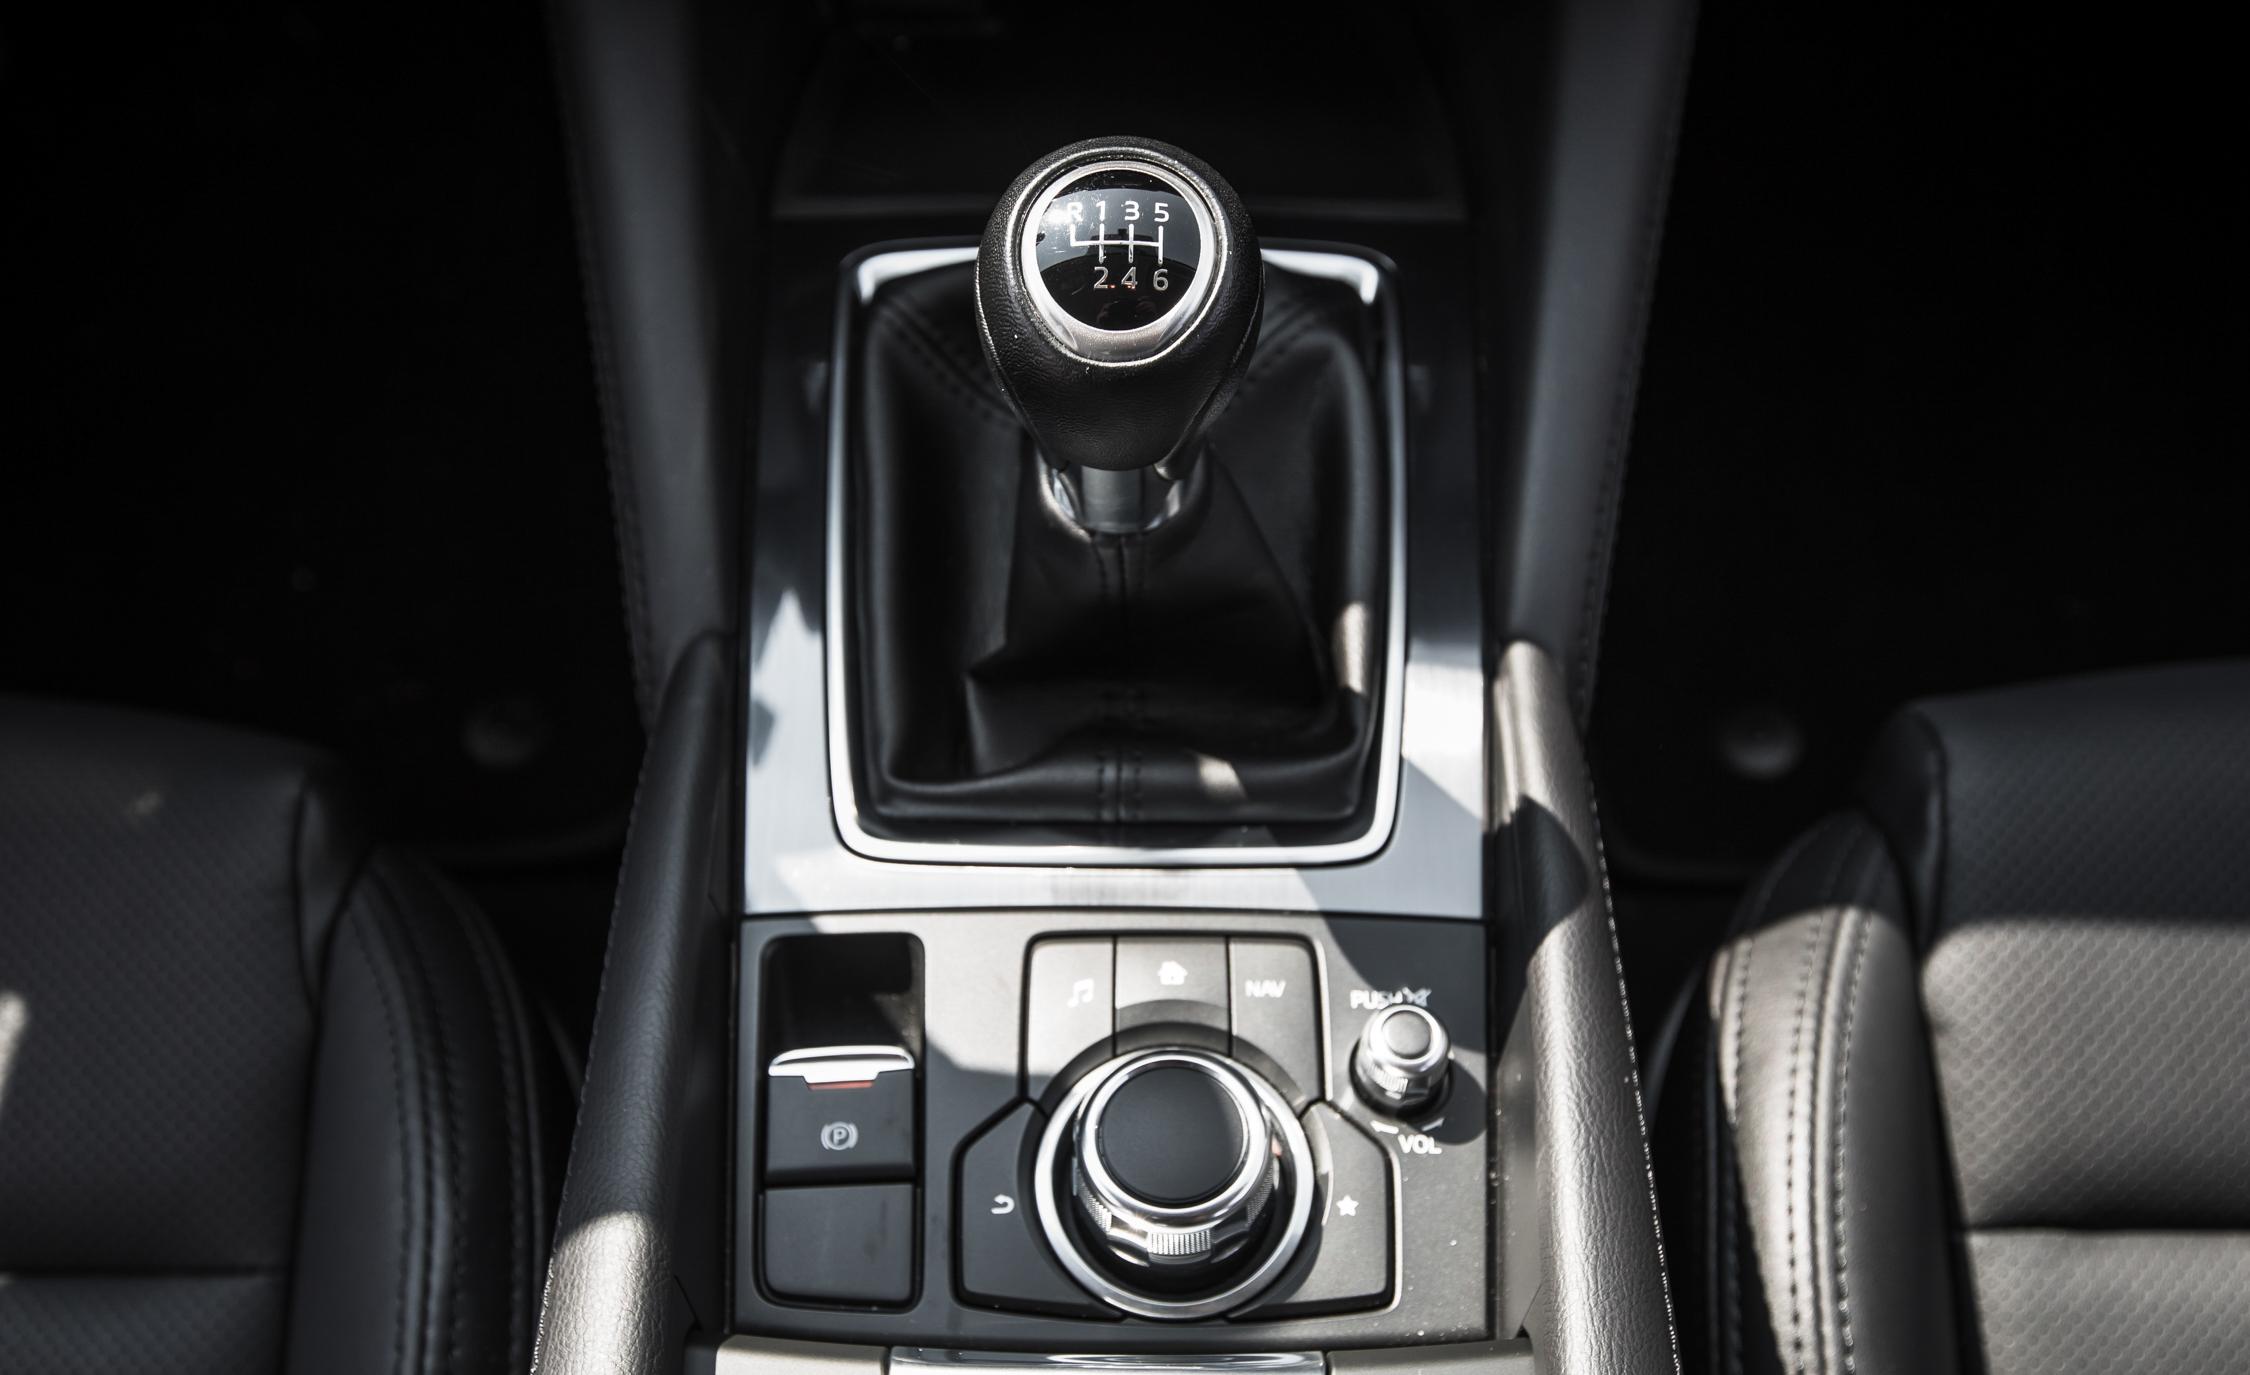 2016 Mazda 6 Touring Interior Gear Shift Knob